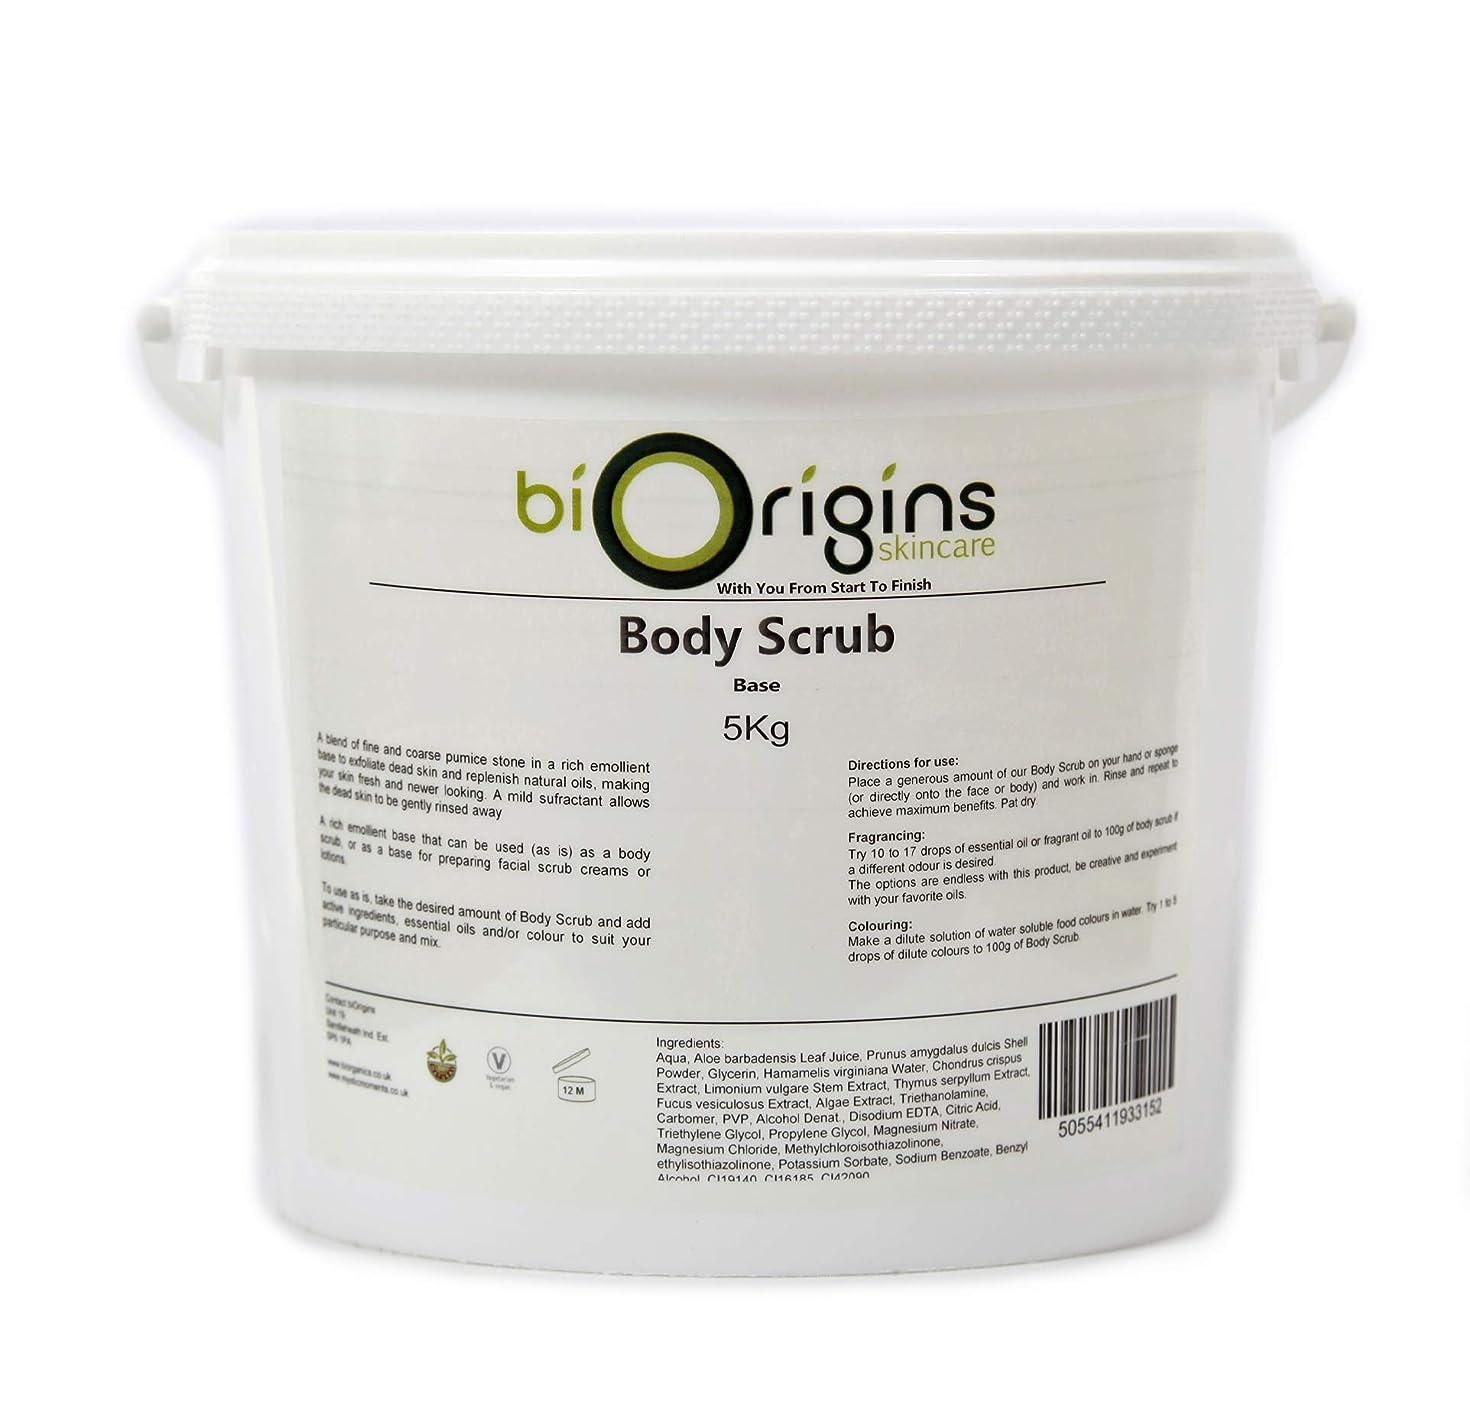 文法帆手術Body Scrub - Unscented - Botanical Skincare Base - 5Kg